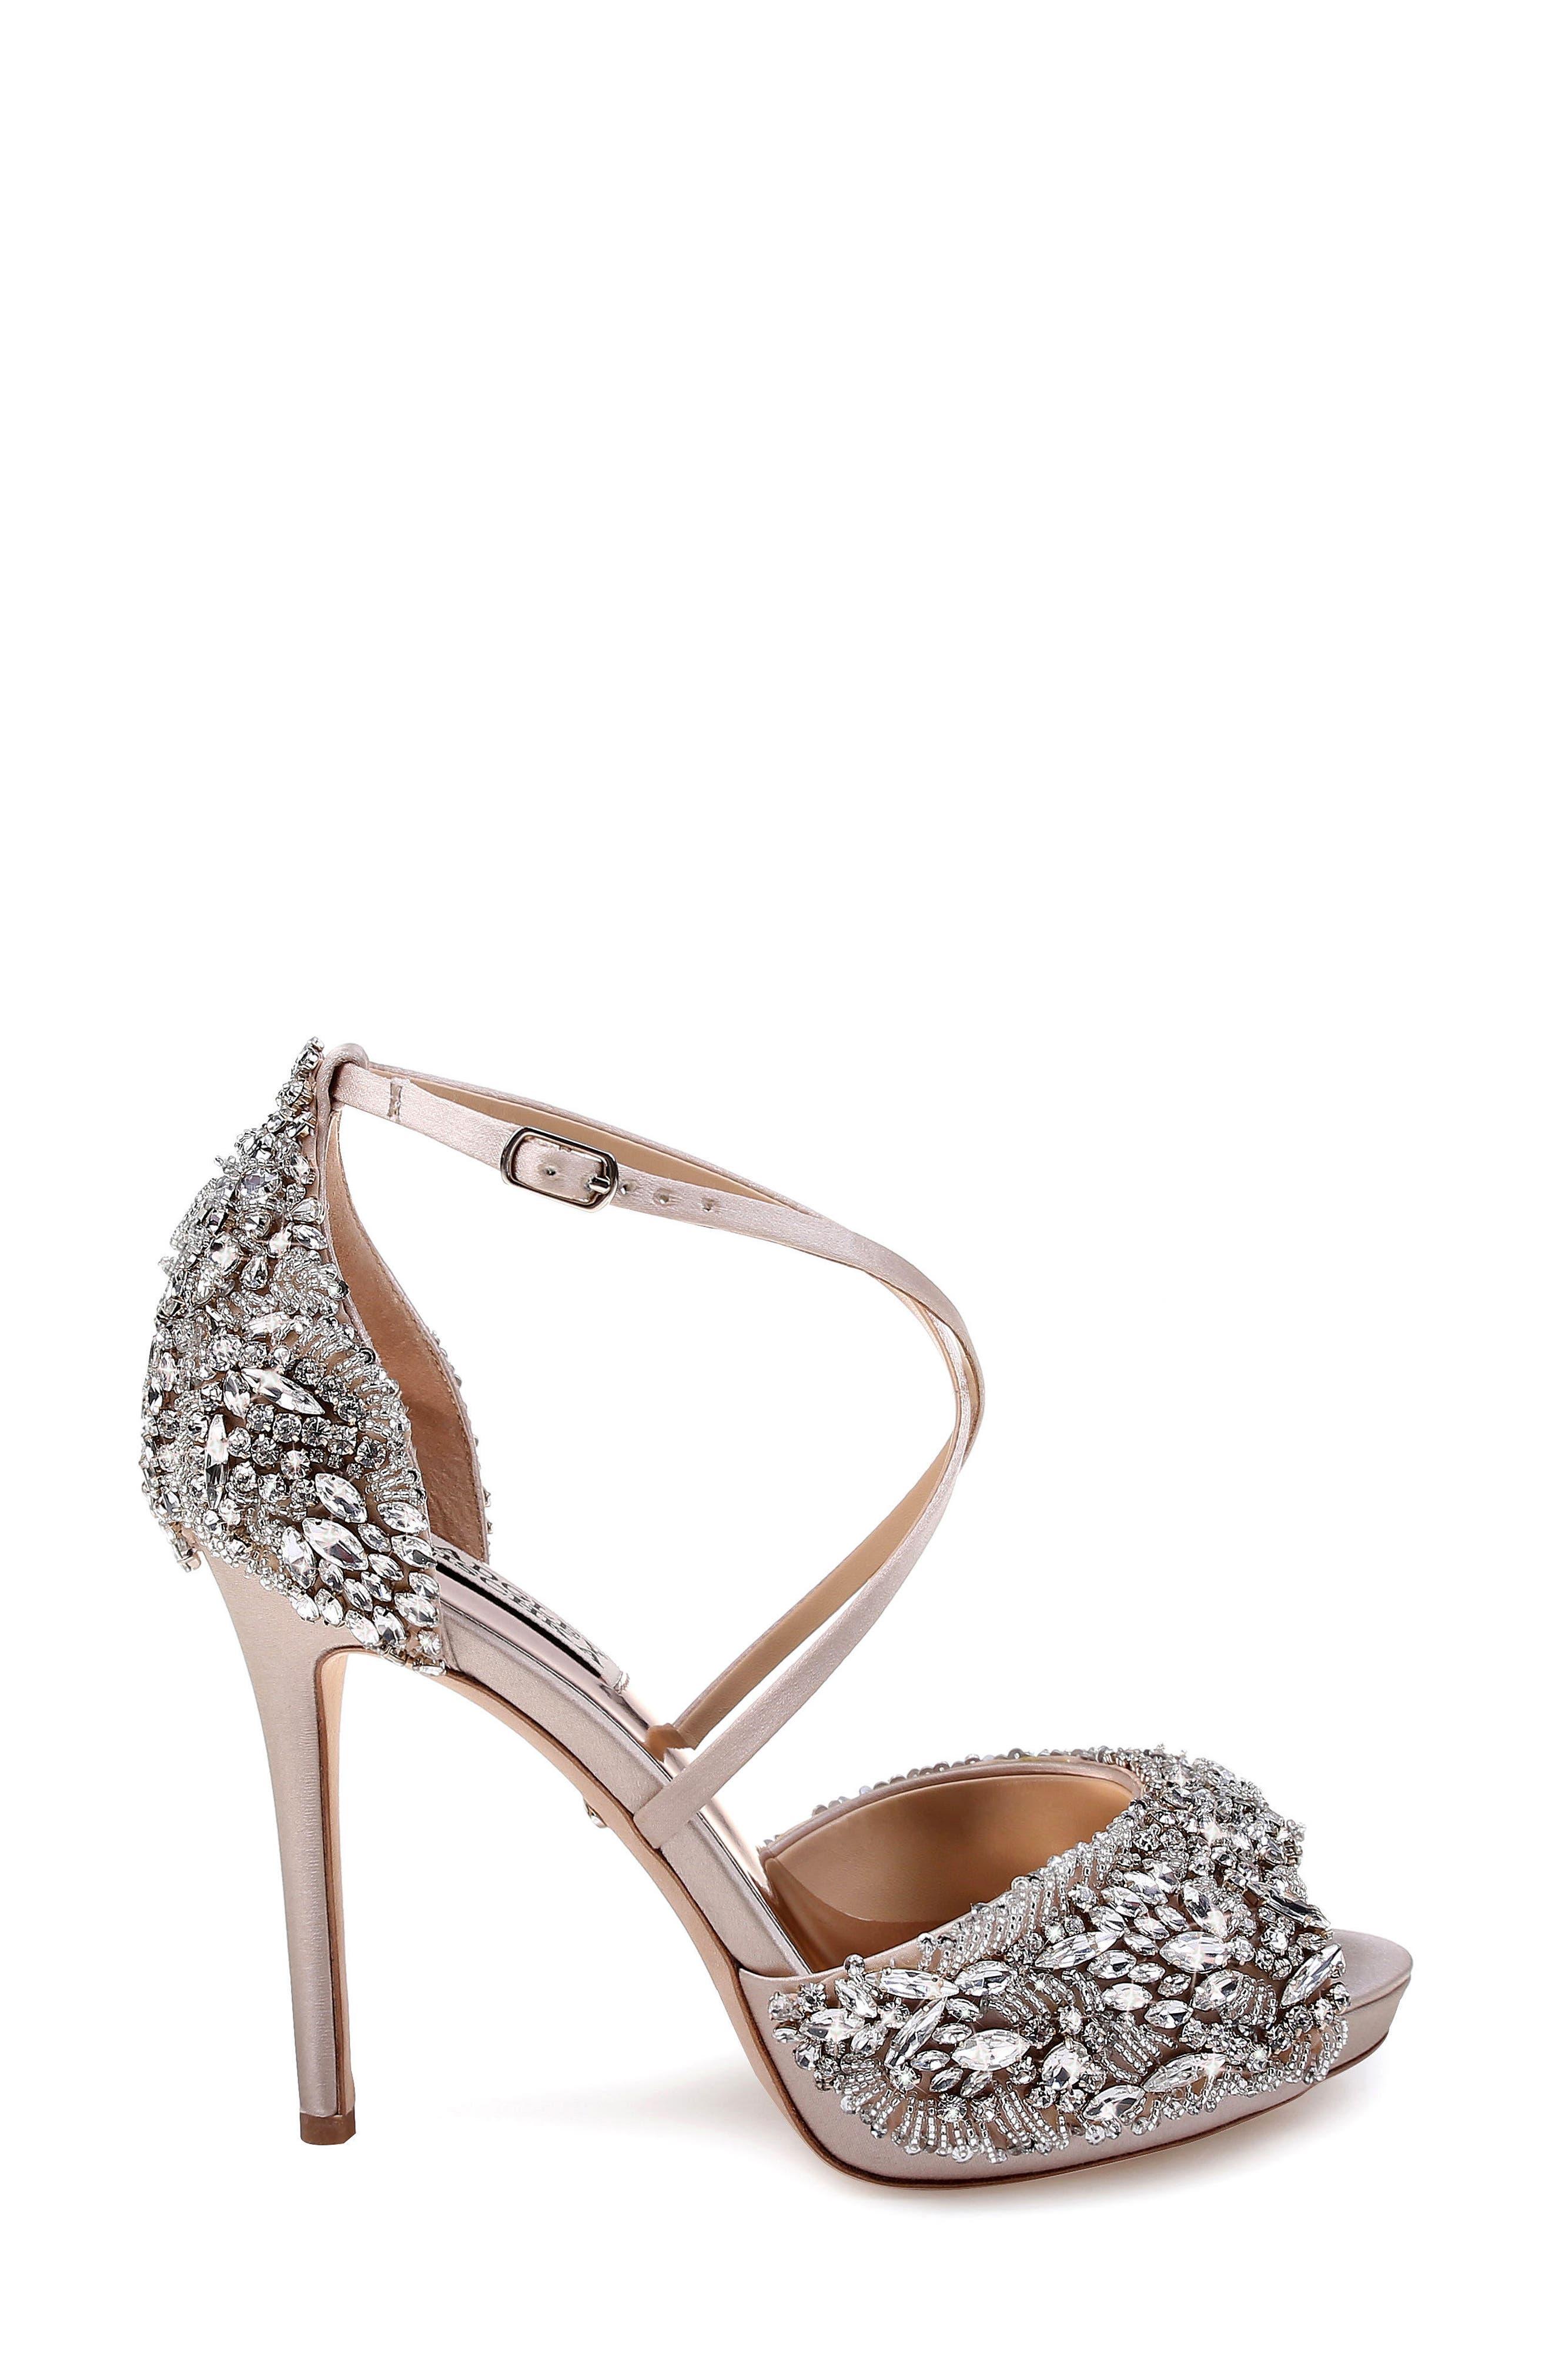 BADGLEY MISCHKA COLLECTION, Badgley Mischka Hyper Crystal Embellished Sandal, Alternate thumbnail 3, color, 100